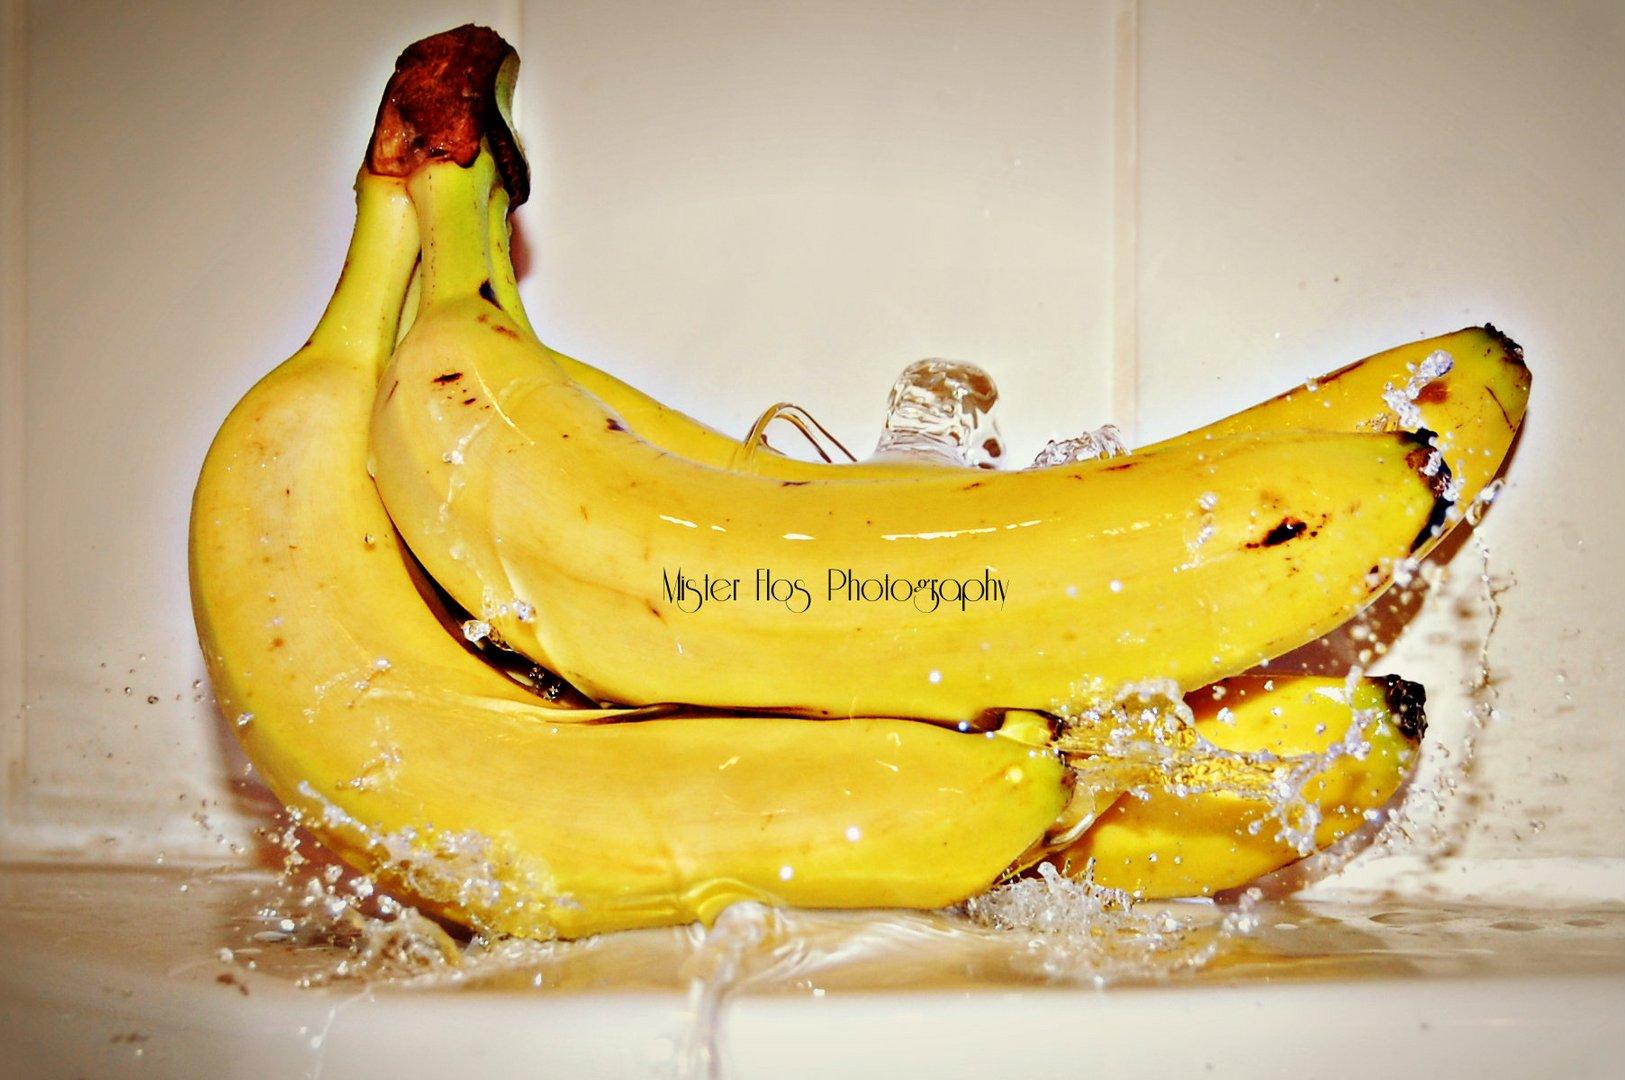 Banane ``°°